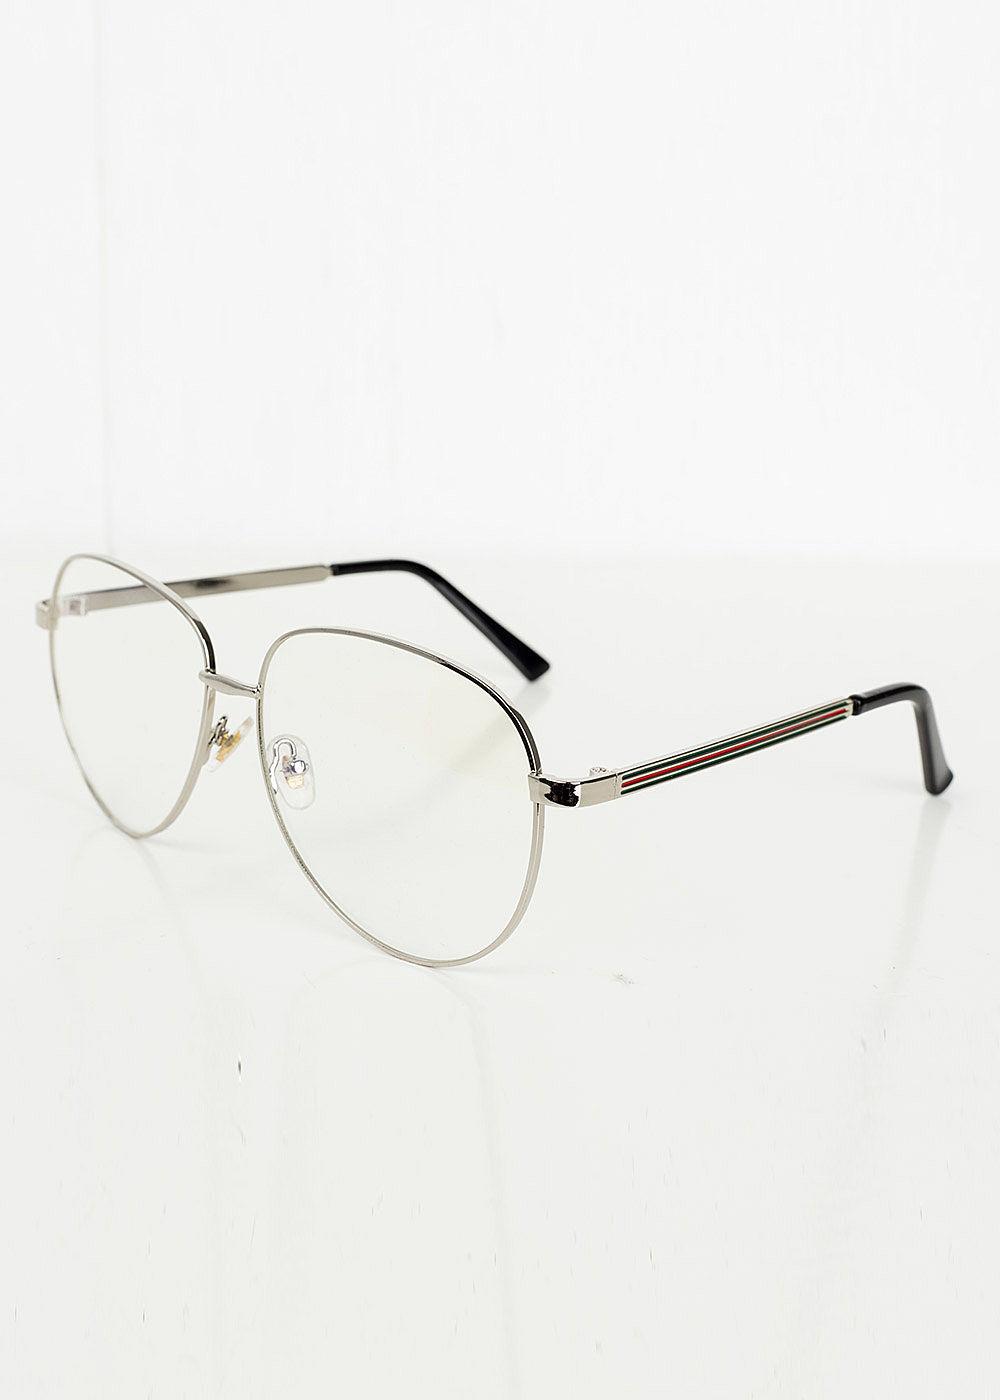 seventyseven lifestyletb damen accessoires brille silber 77onlineshop. Black Bedroom Furniture Sets. Home Design Ideas